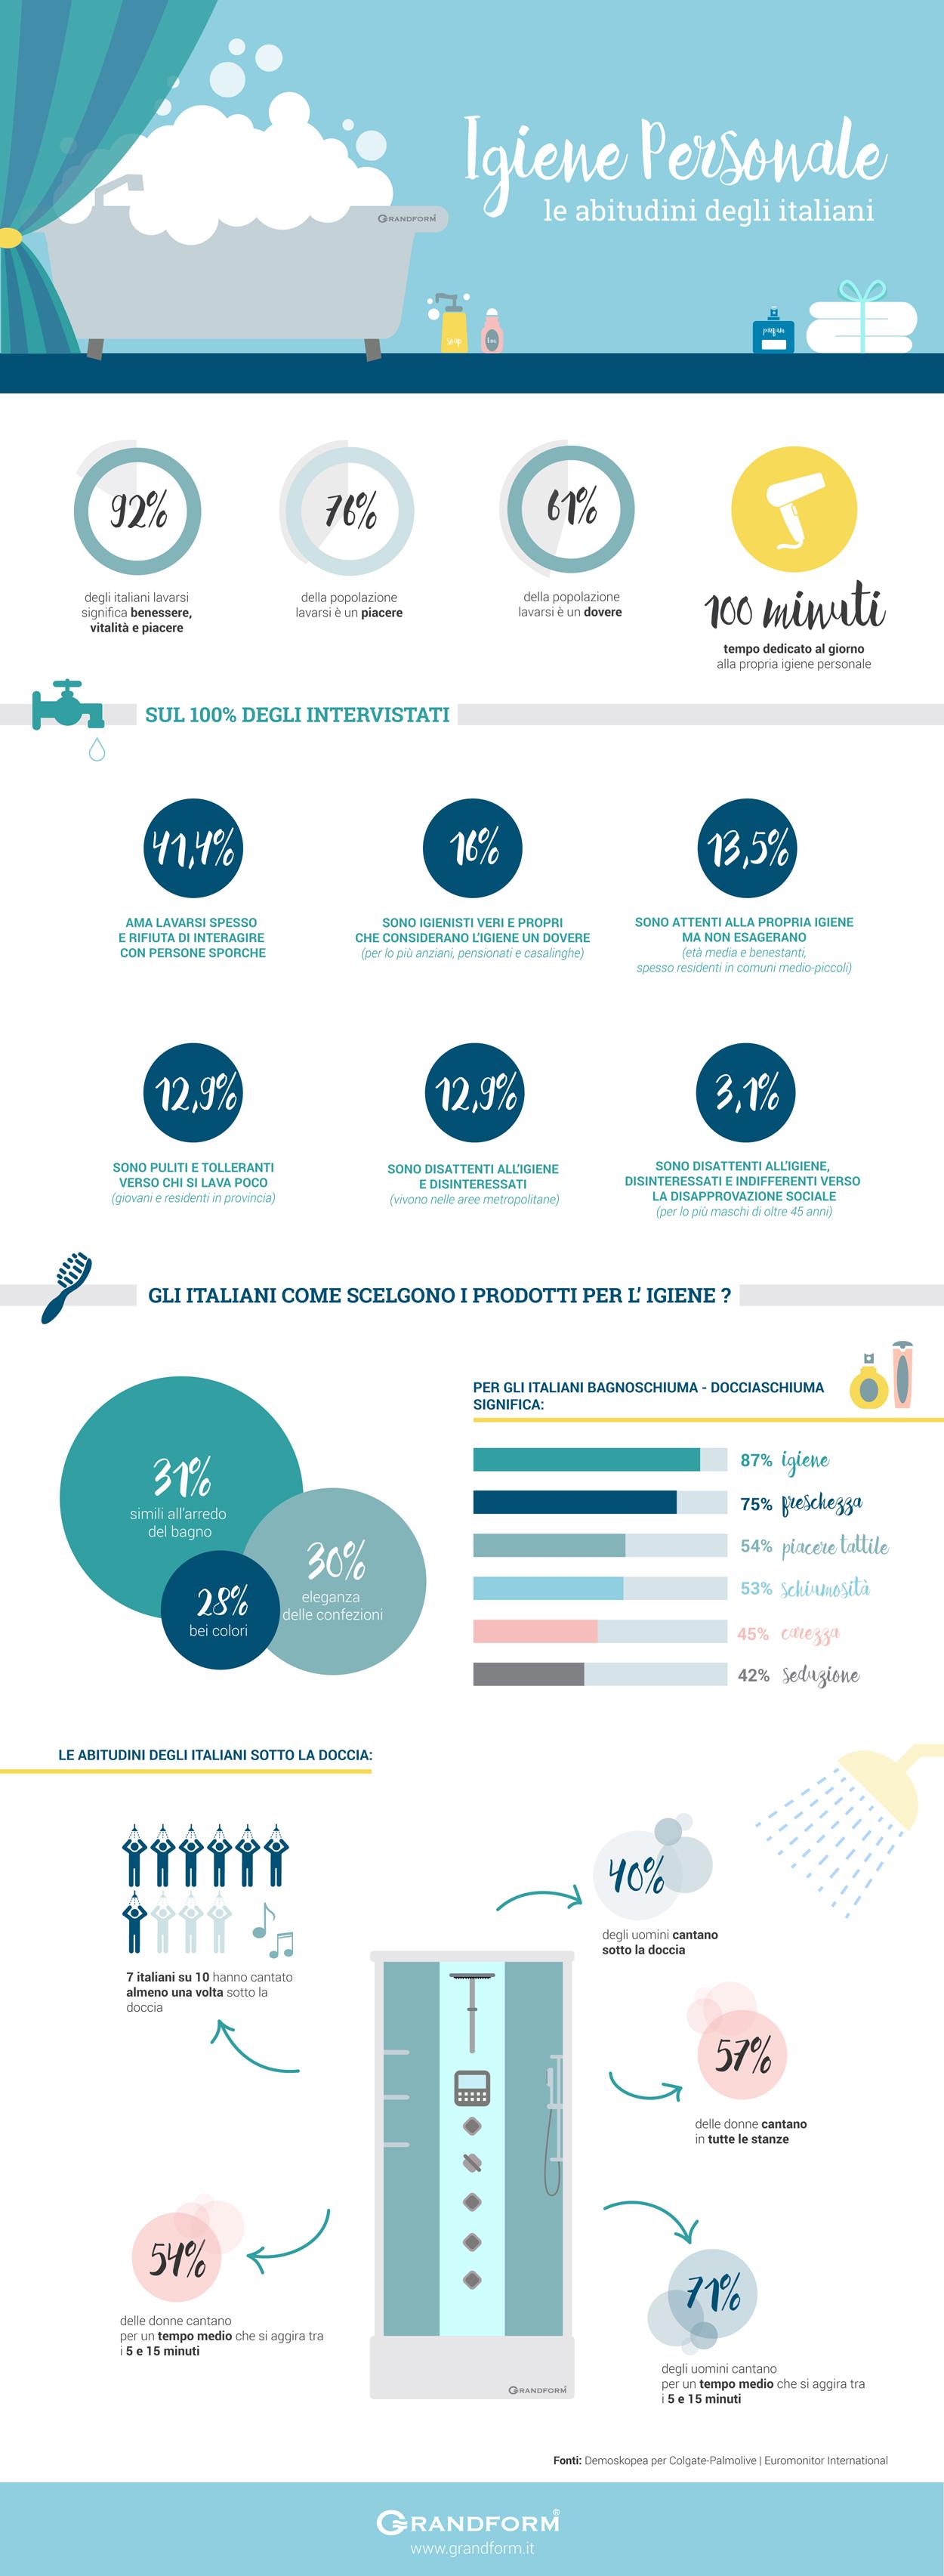 infografica-grandform